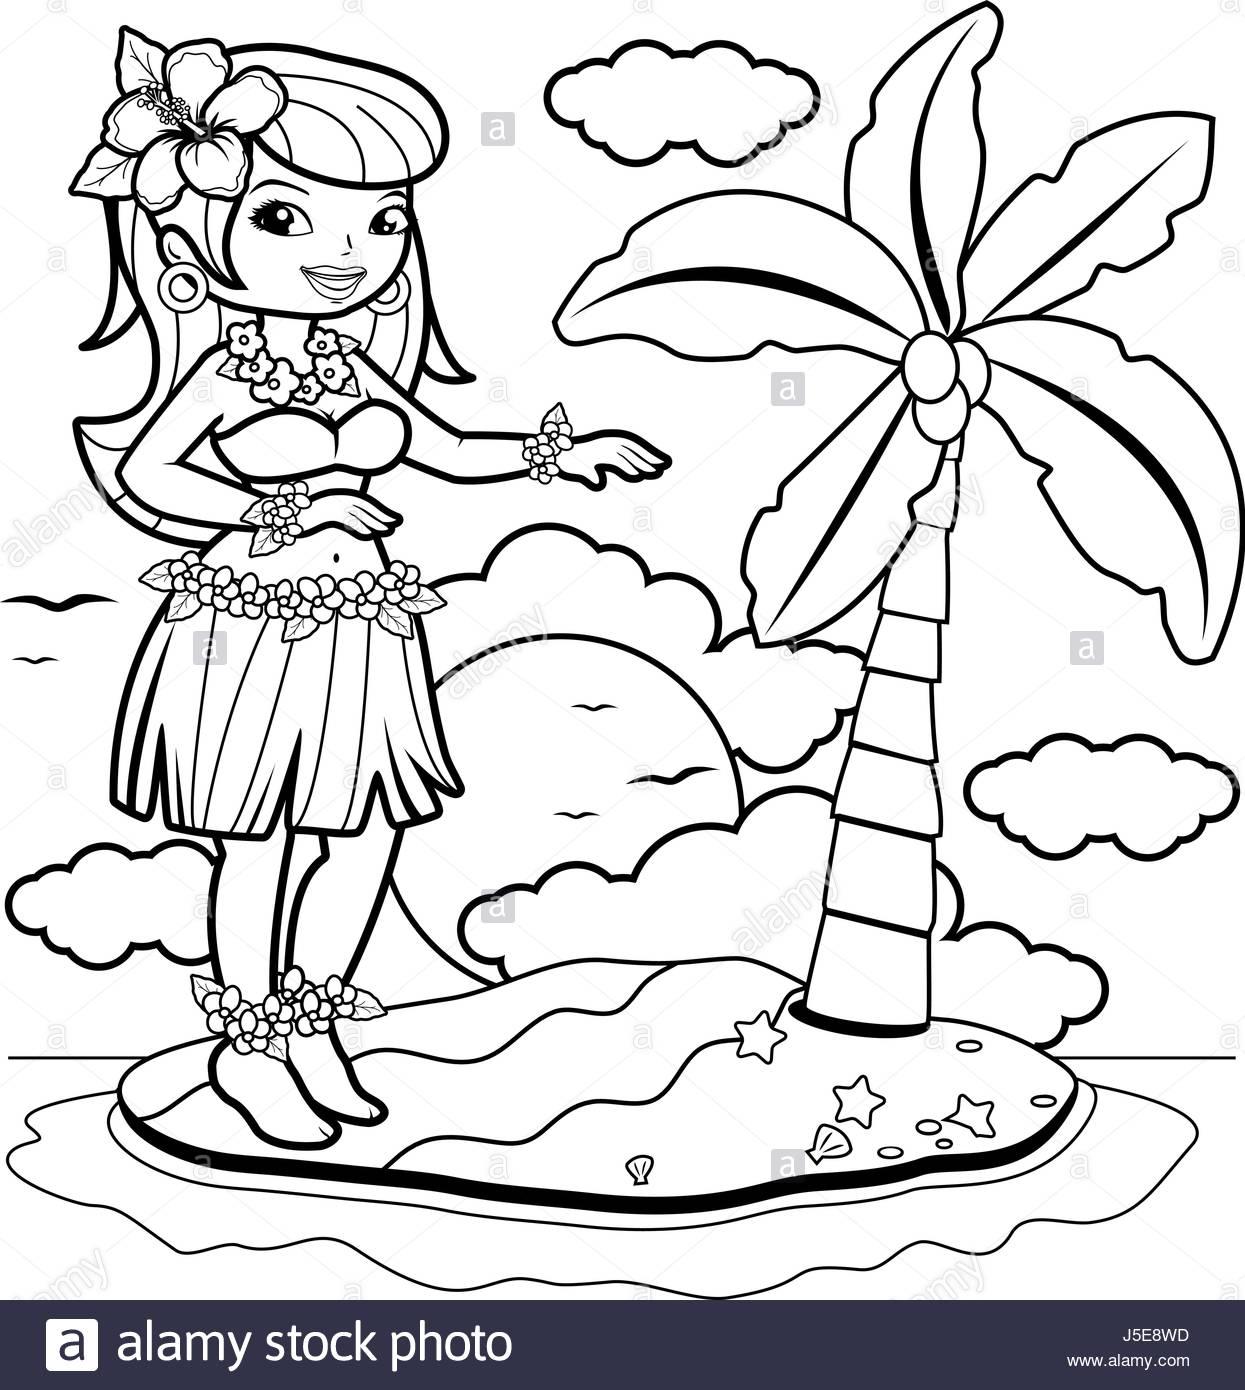 1245x1390 Hawaiian Woman Hula Dancer On An Island. Coloring Book Page Stock